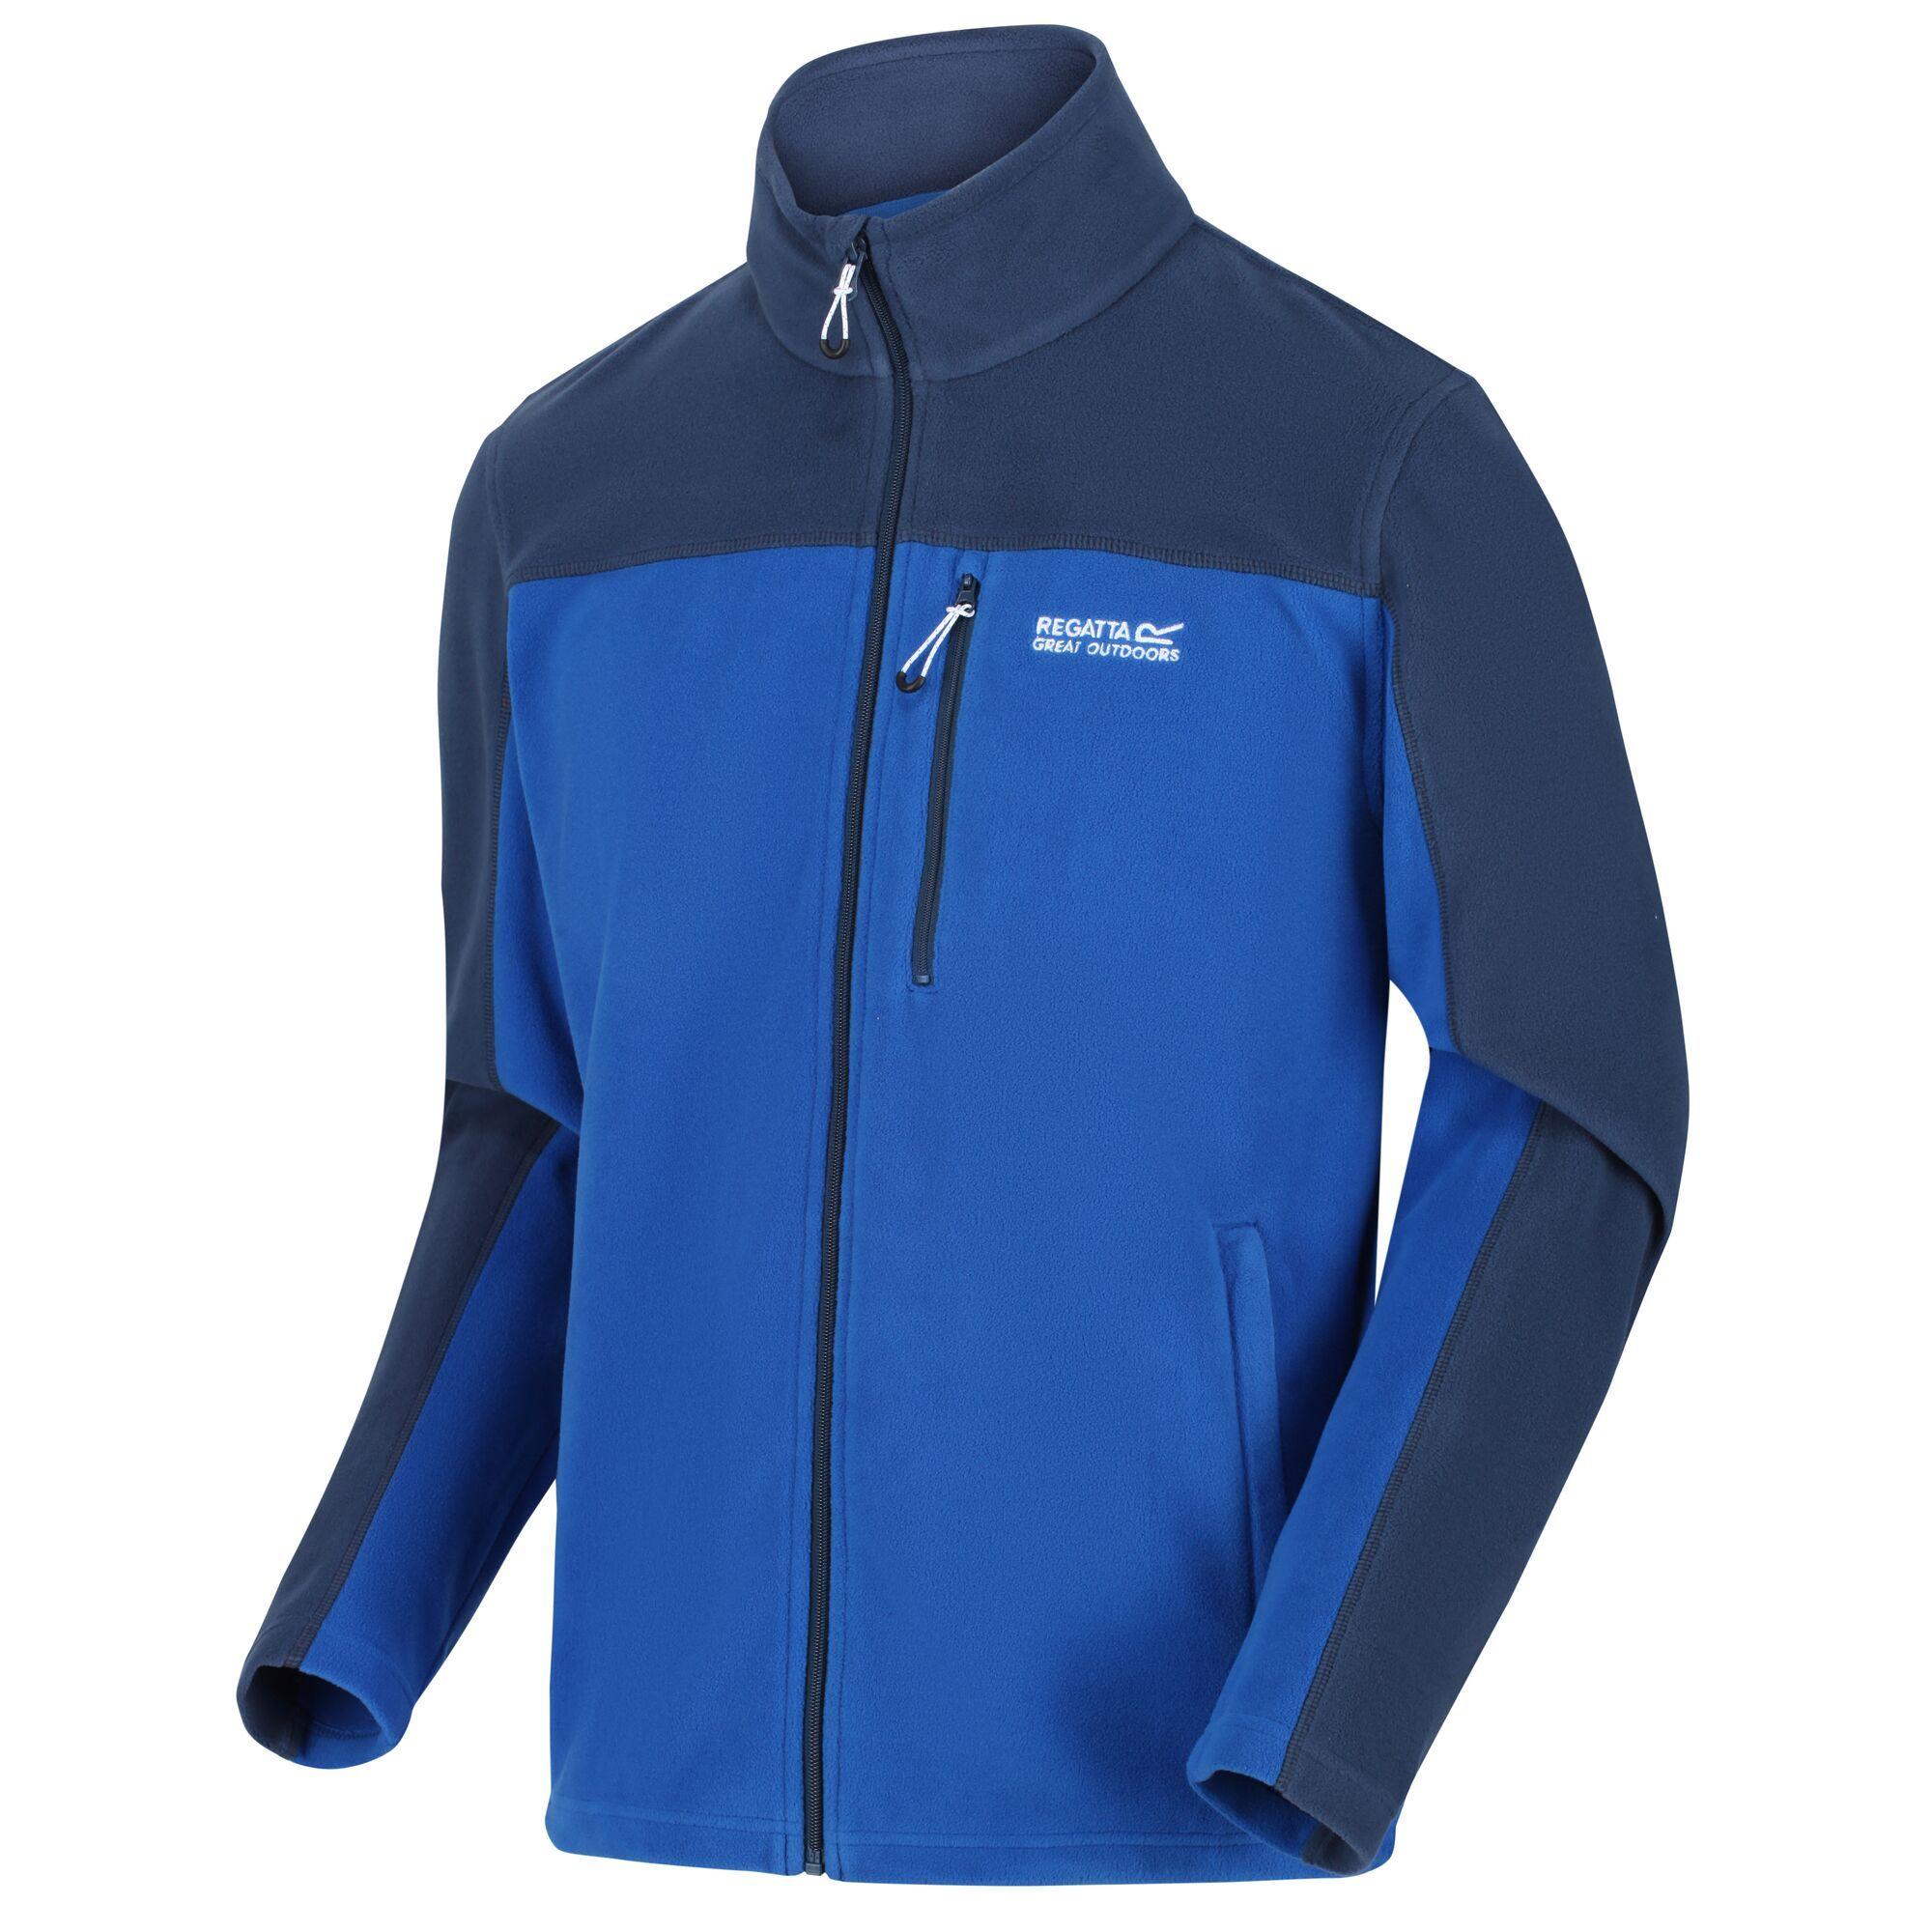 thumbnail 4 - Regatta Fellard Mens Lightweight Full Zip Warm Walking Fleece Jacket RRP £30